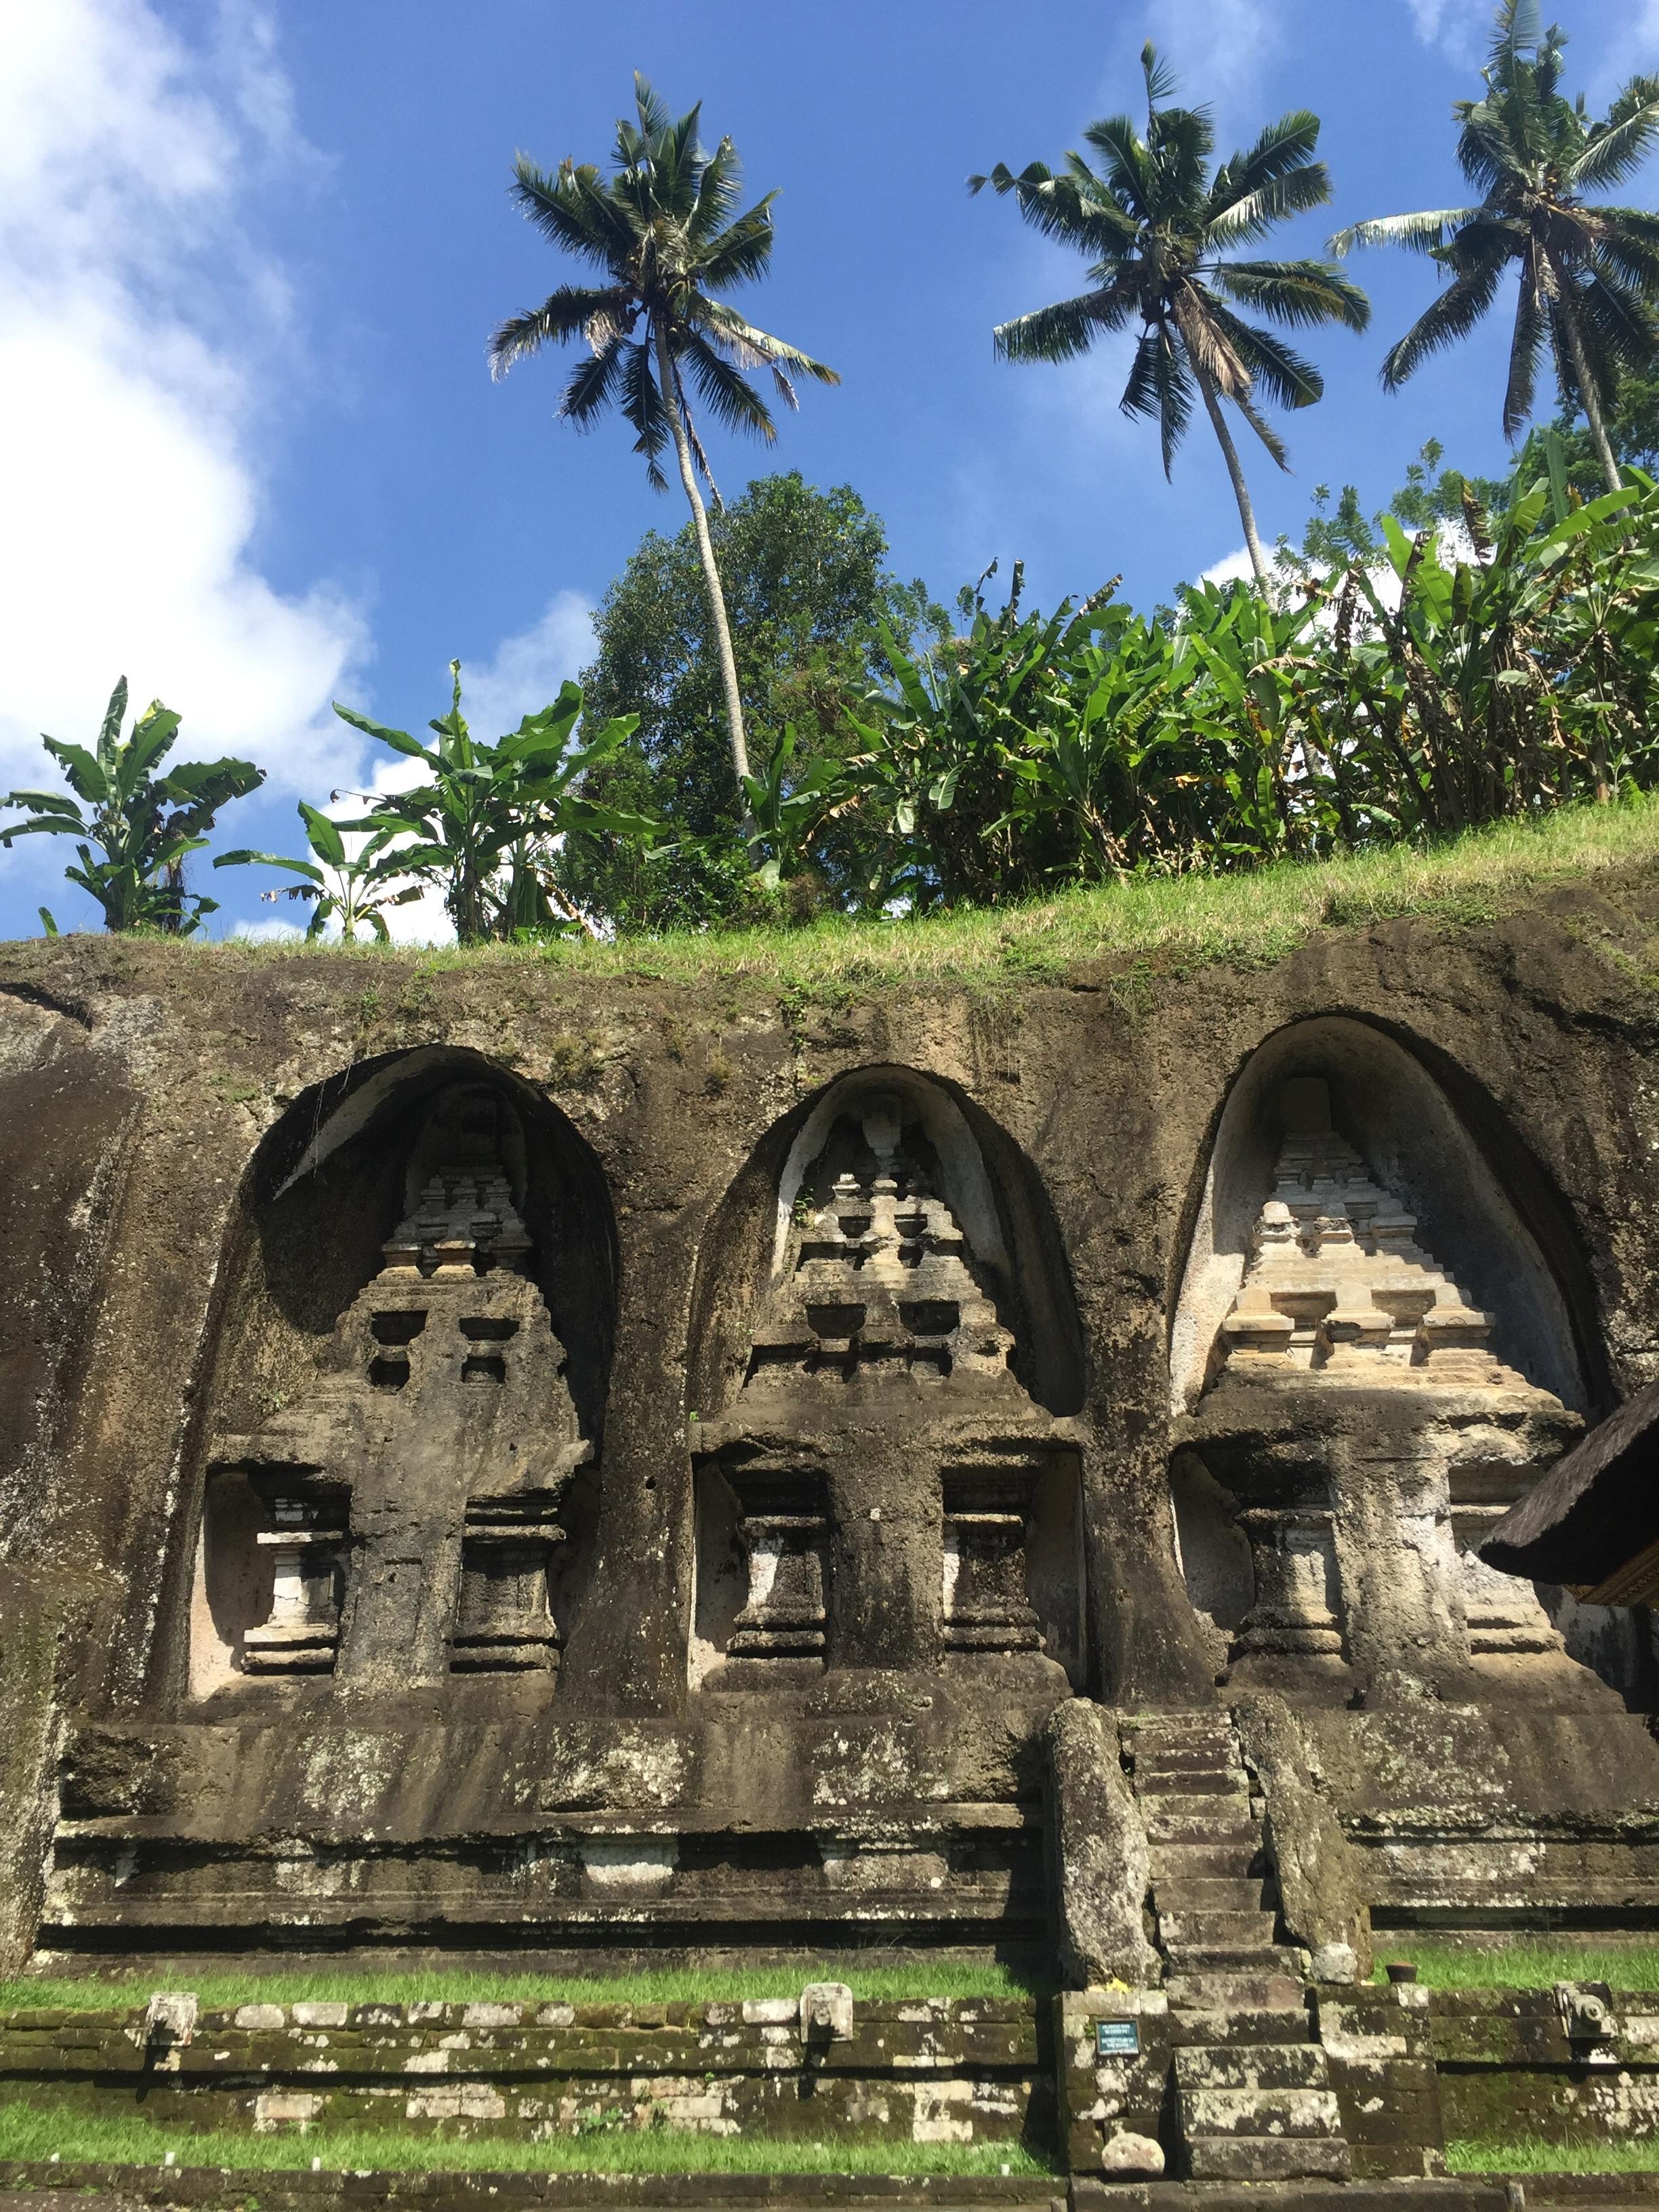 Gunung Kawi Temple Bali.JPG